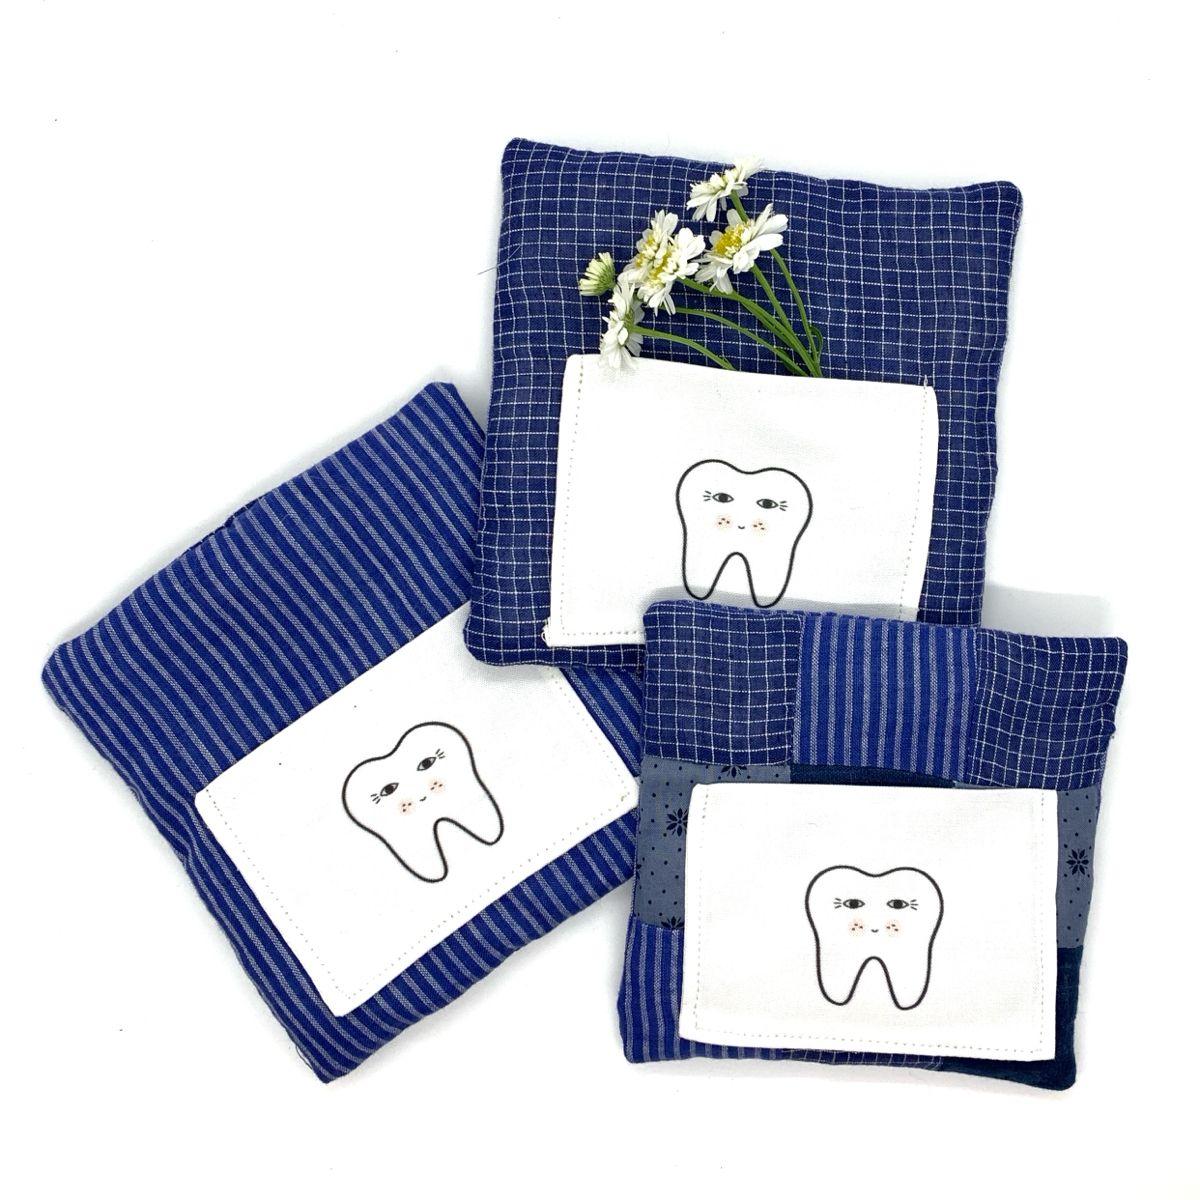 Handmade tooth fairy pillow . #toothfairyiscomingtonight #toothfairyiscoming #toothfairyideas #toothfairypouch